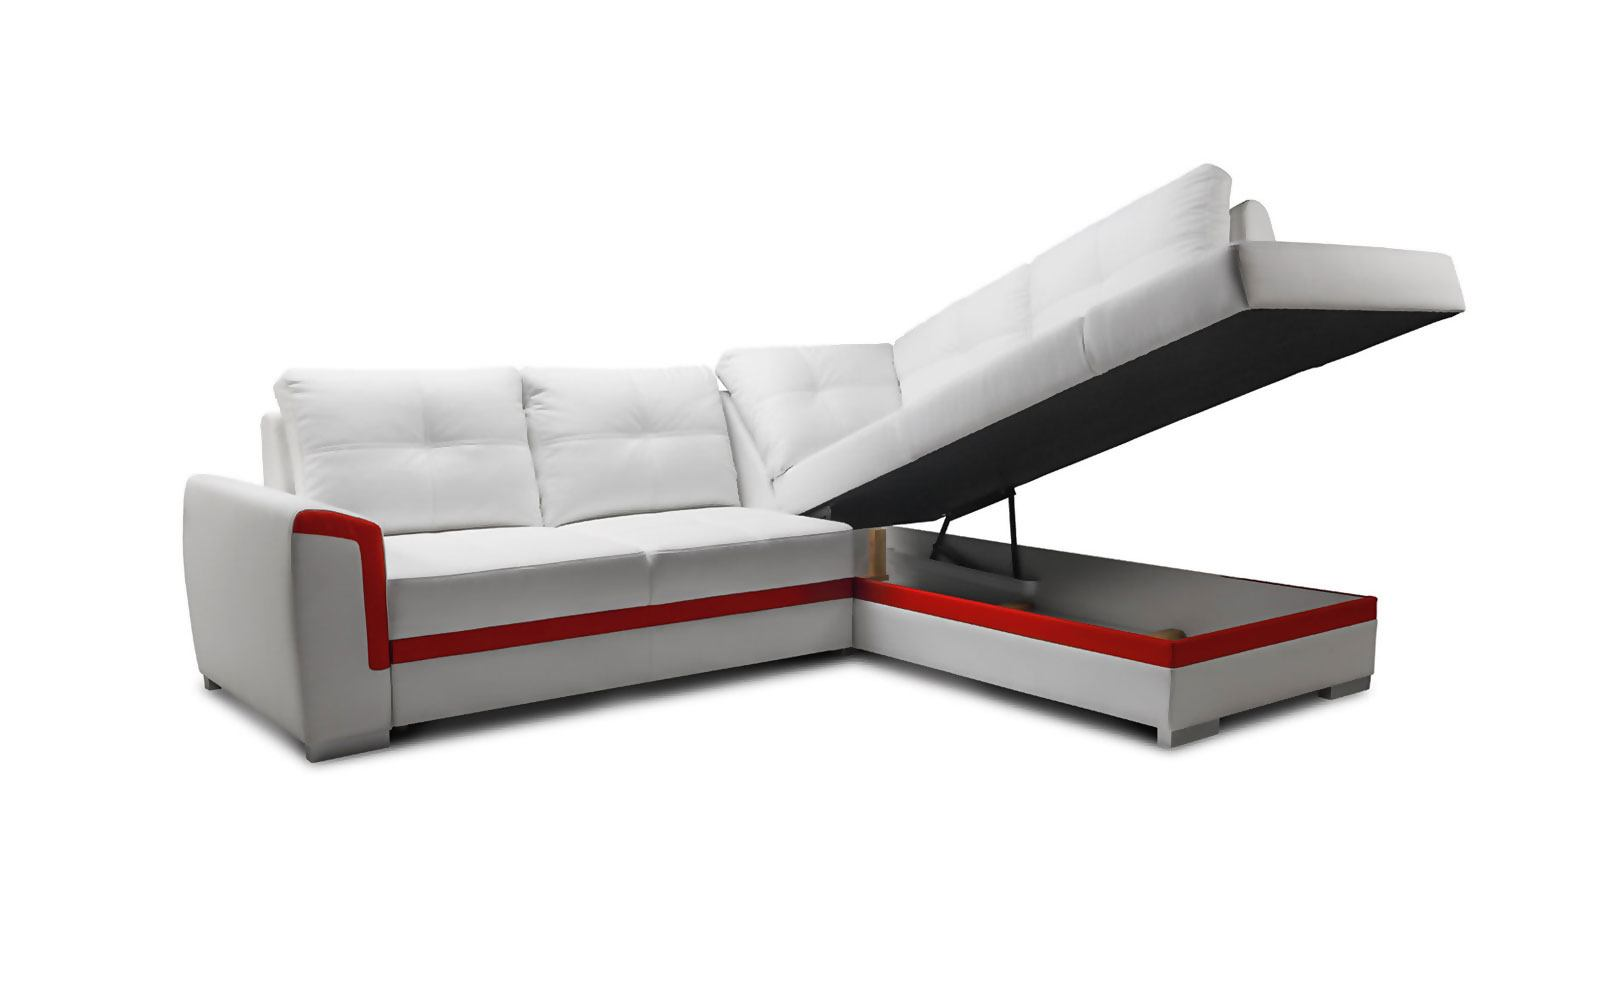 VERONA SECTIONAL SOFA-BED